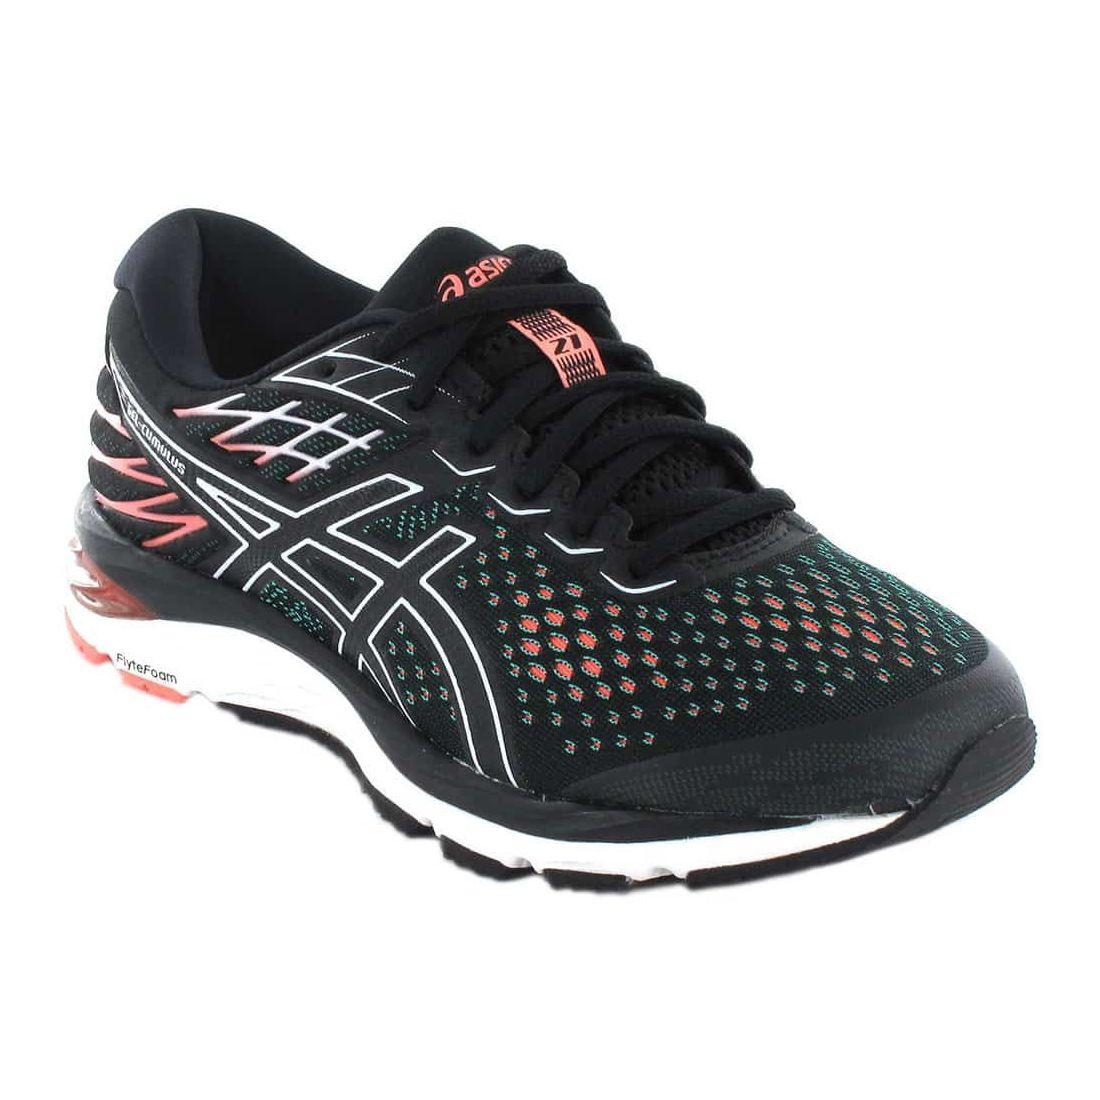 Asics Gel Cumulus 21 W Asics Running Shoes Woman Running Shoes Running Sizes: 38, 39, 39,5, 40, 40,5, 41,5; Color: